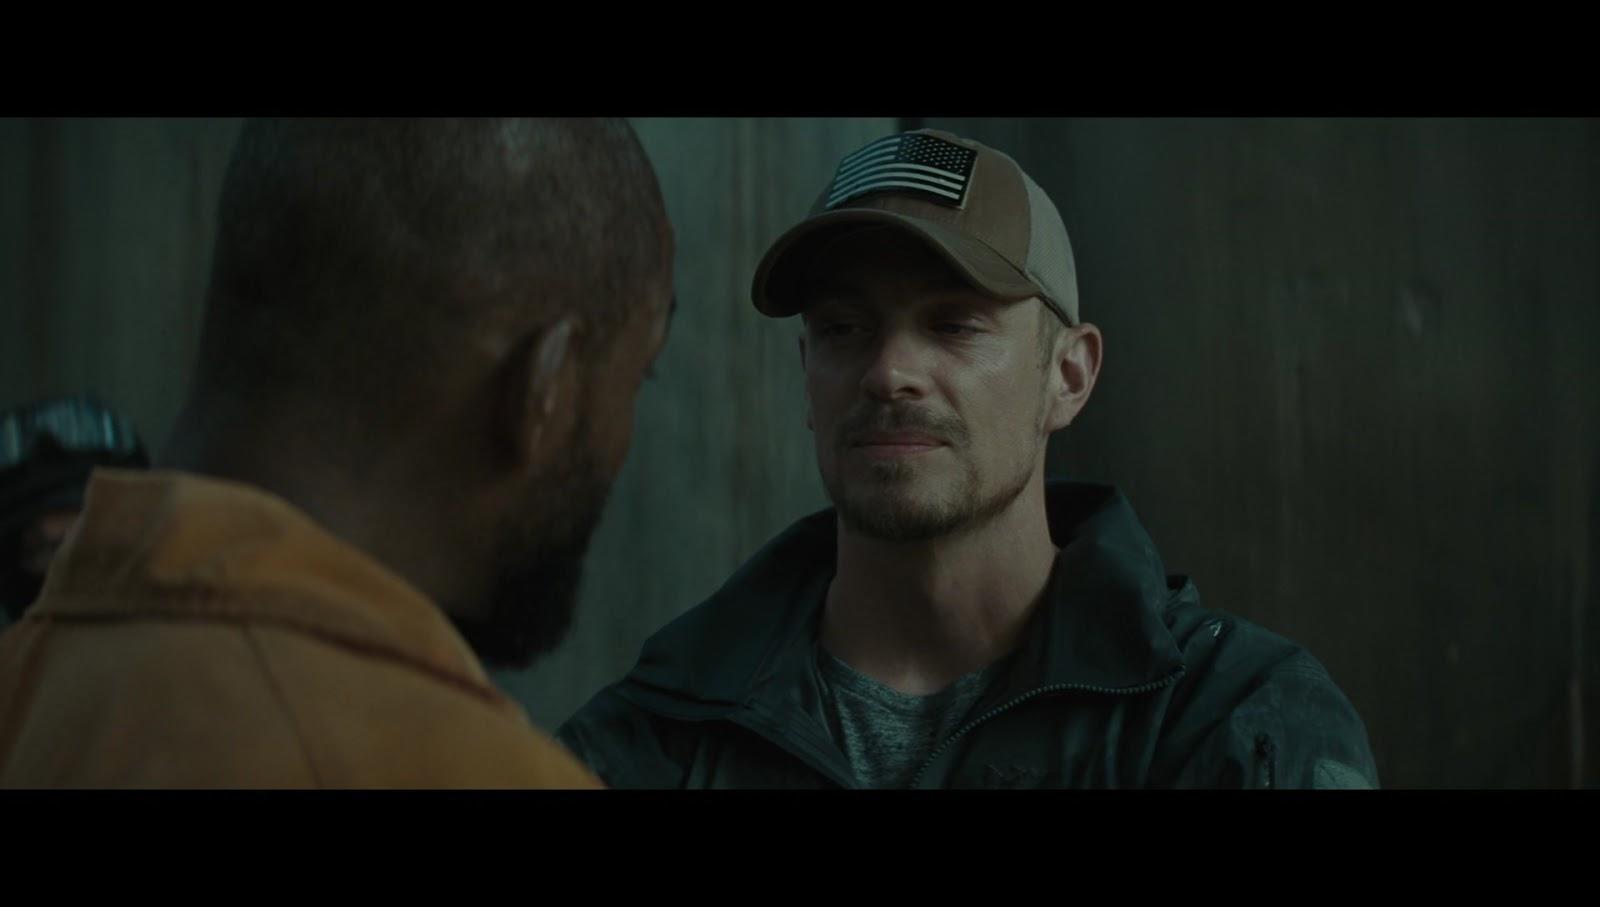 Captura de Suicide Squad (2016) EXTENDED CUT x265 HEVC 1080p Subtitulos Latino